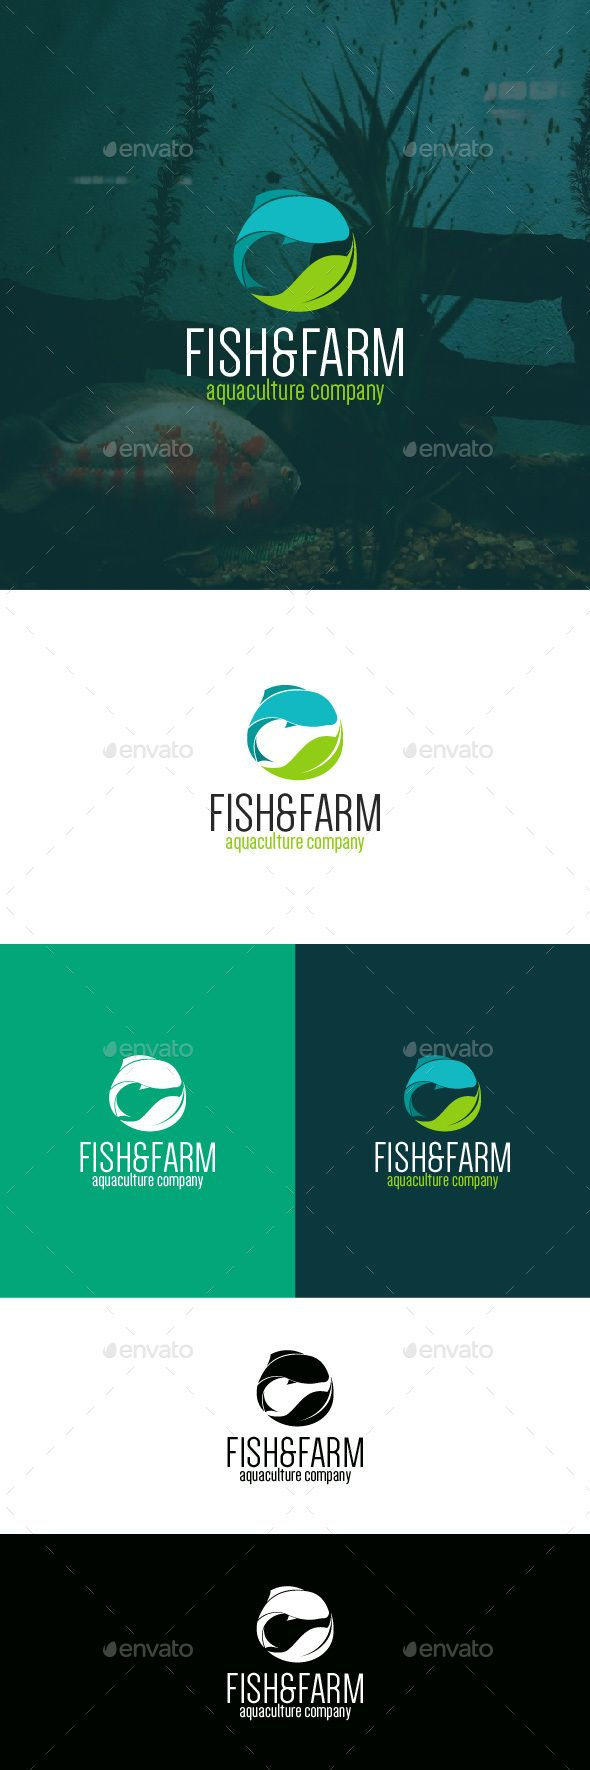 Fish & Farm - Logo Design Template Vector #logotype Download it here: graphicriv...